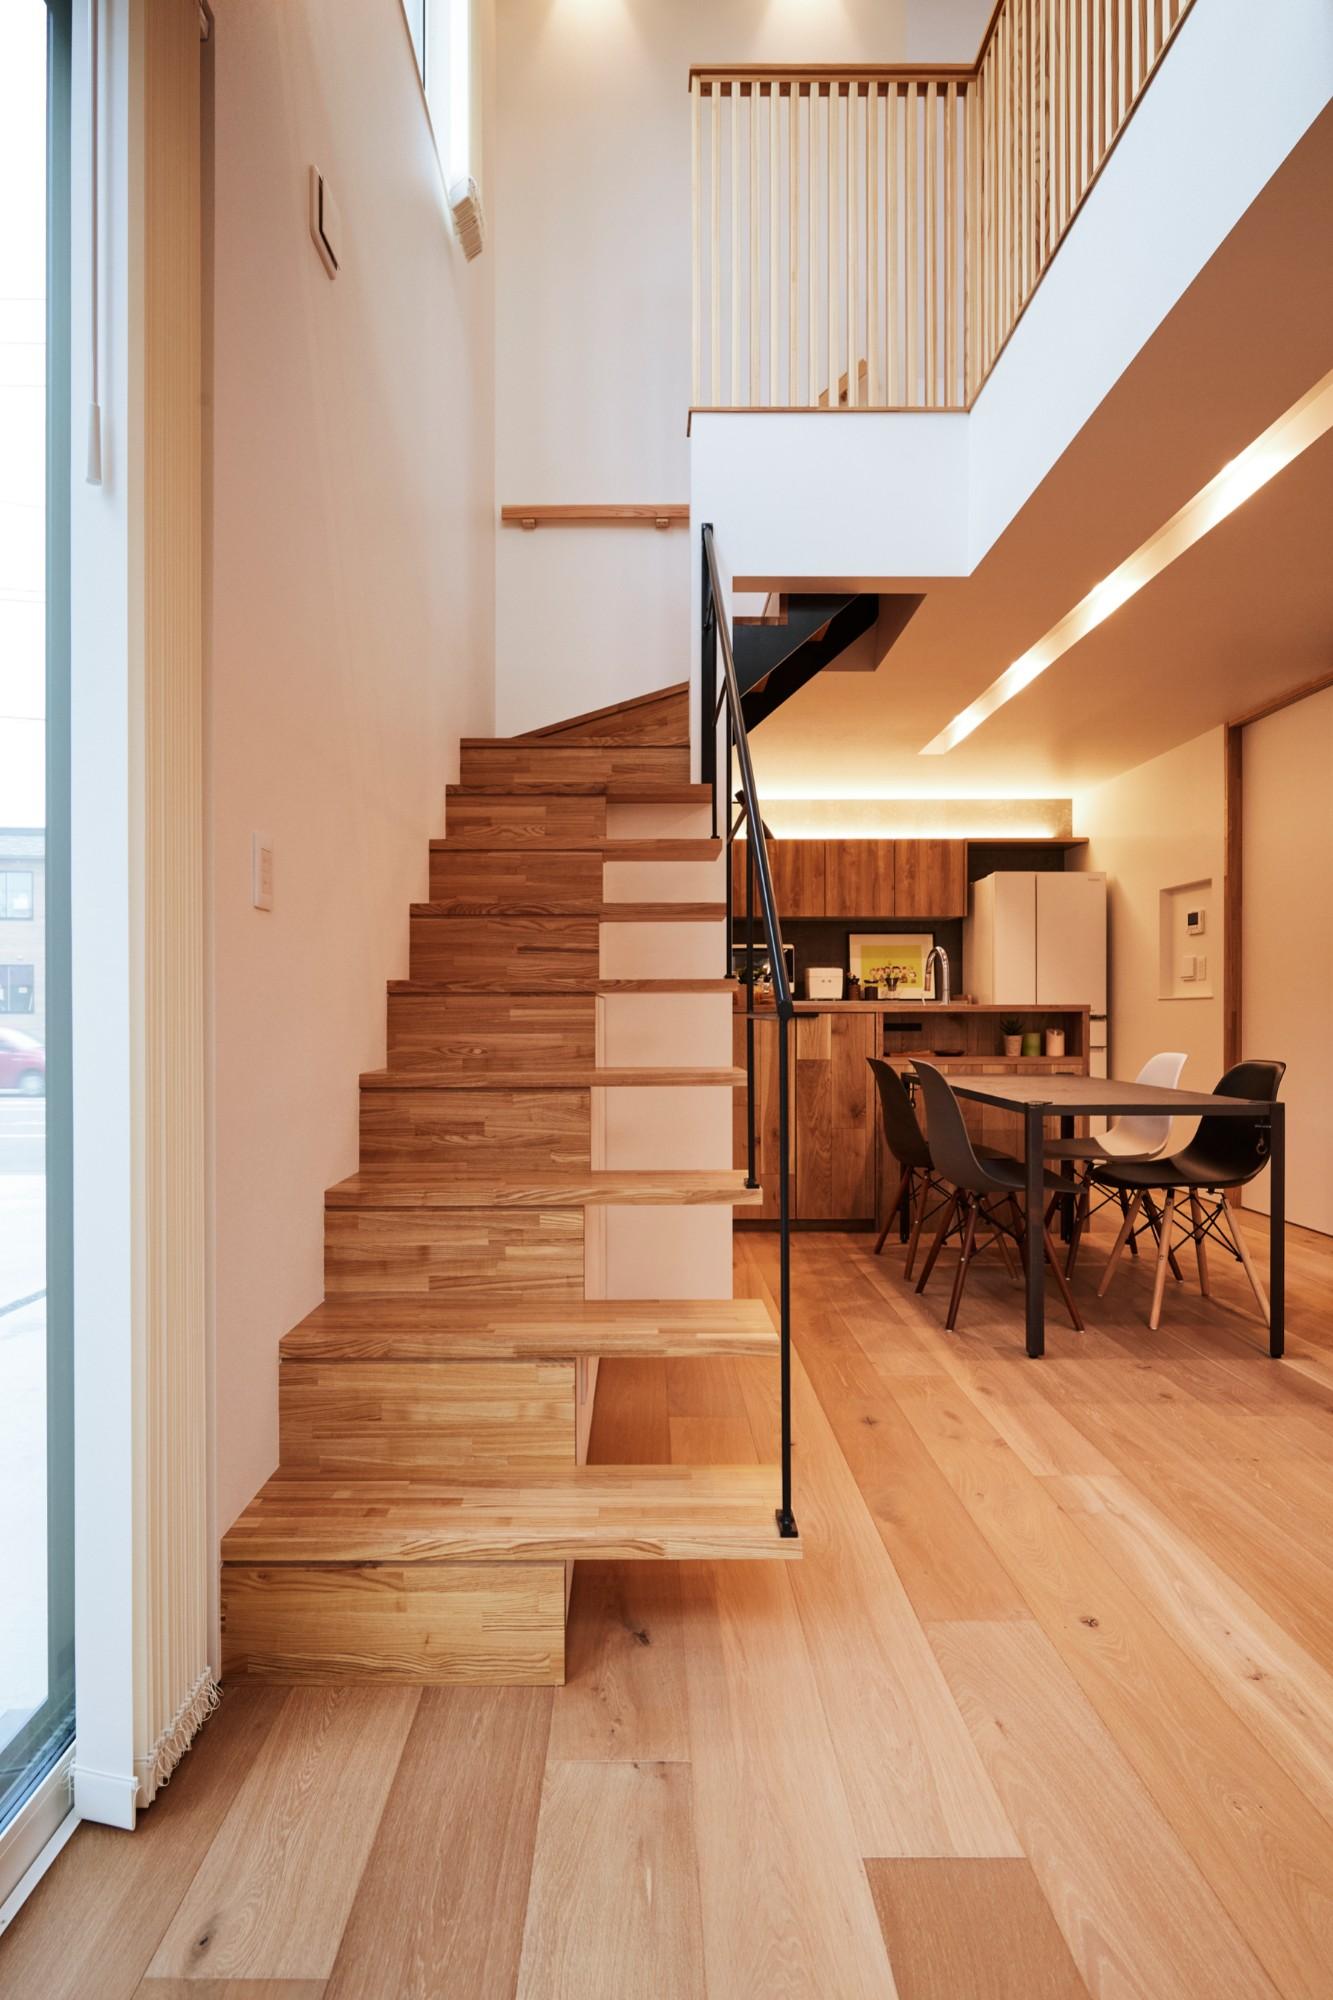 DETAIL HOME(ディテールホーム)「コンパクトにデザインする家」のシンプル・ナチュラルな階段の実例写真